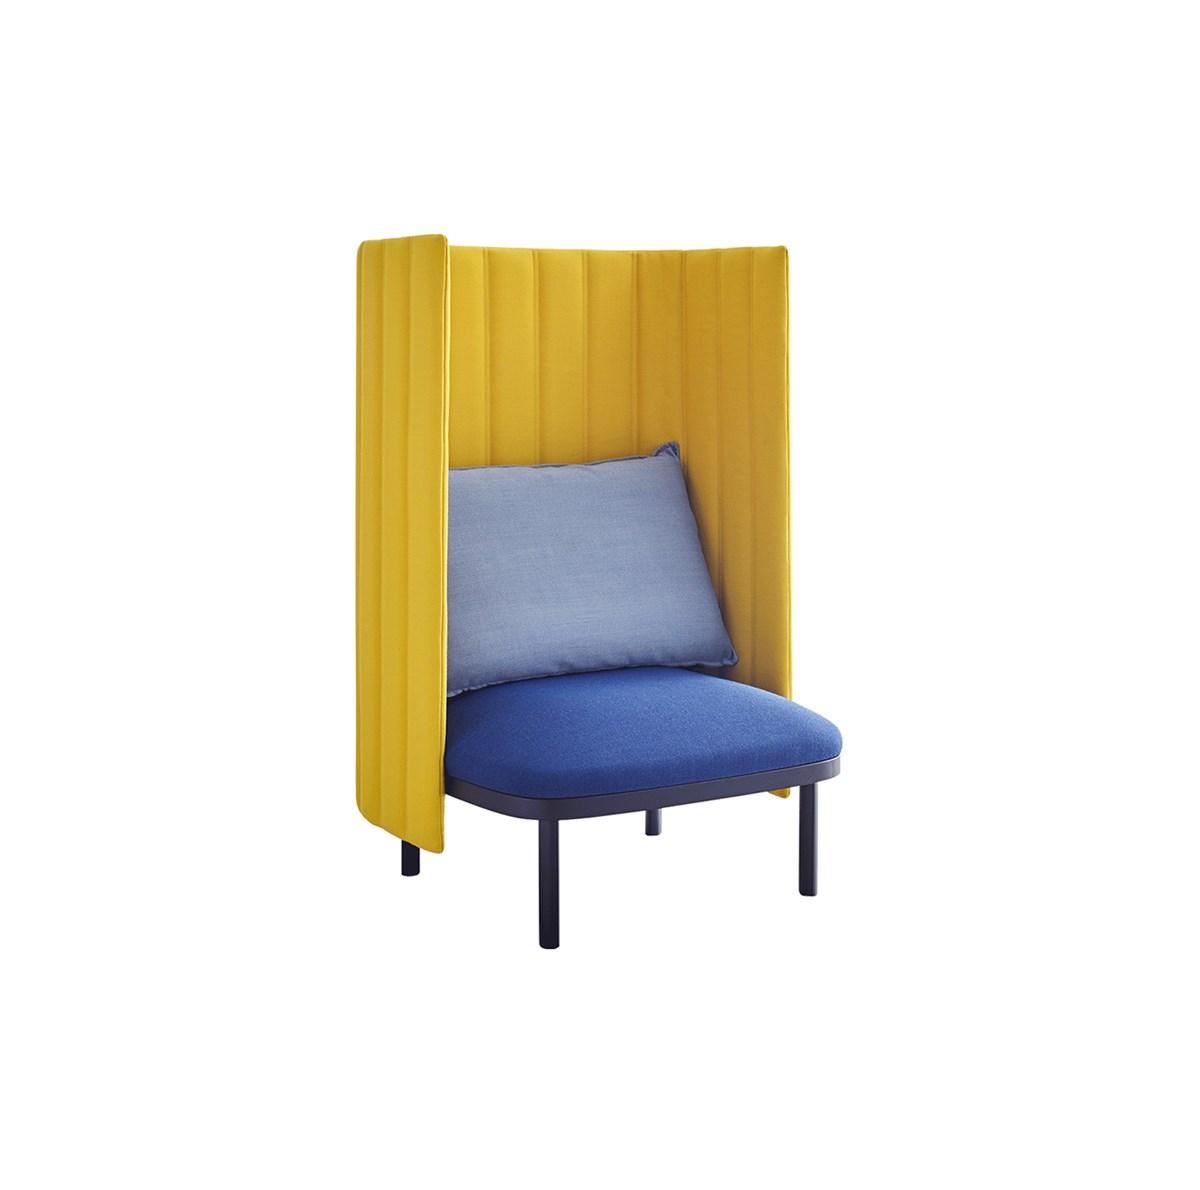 Opheli-SUM-Modula-Seating-System-Matisse-1